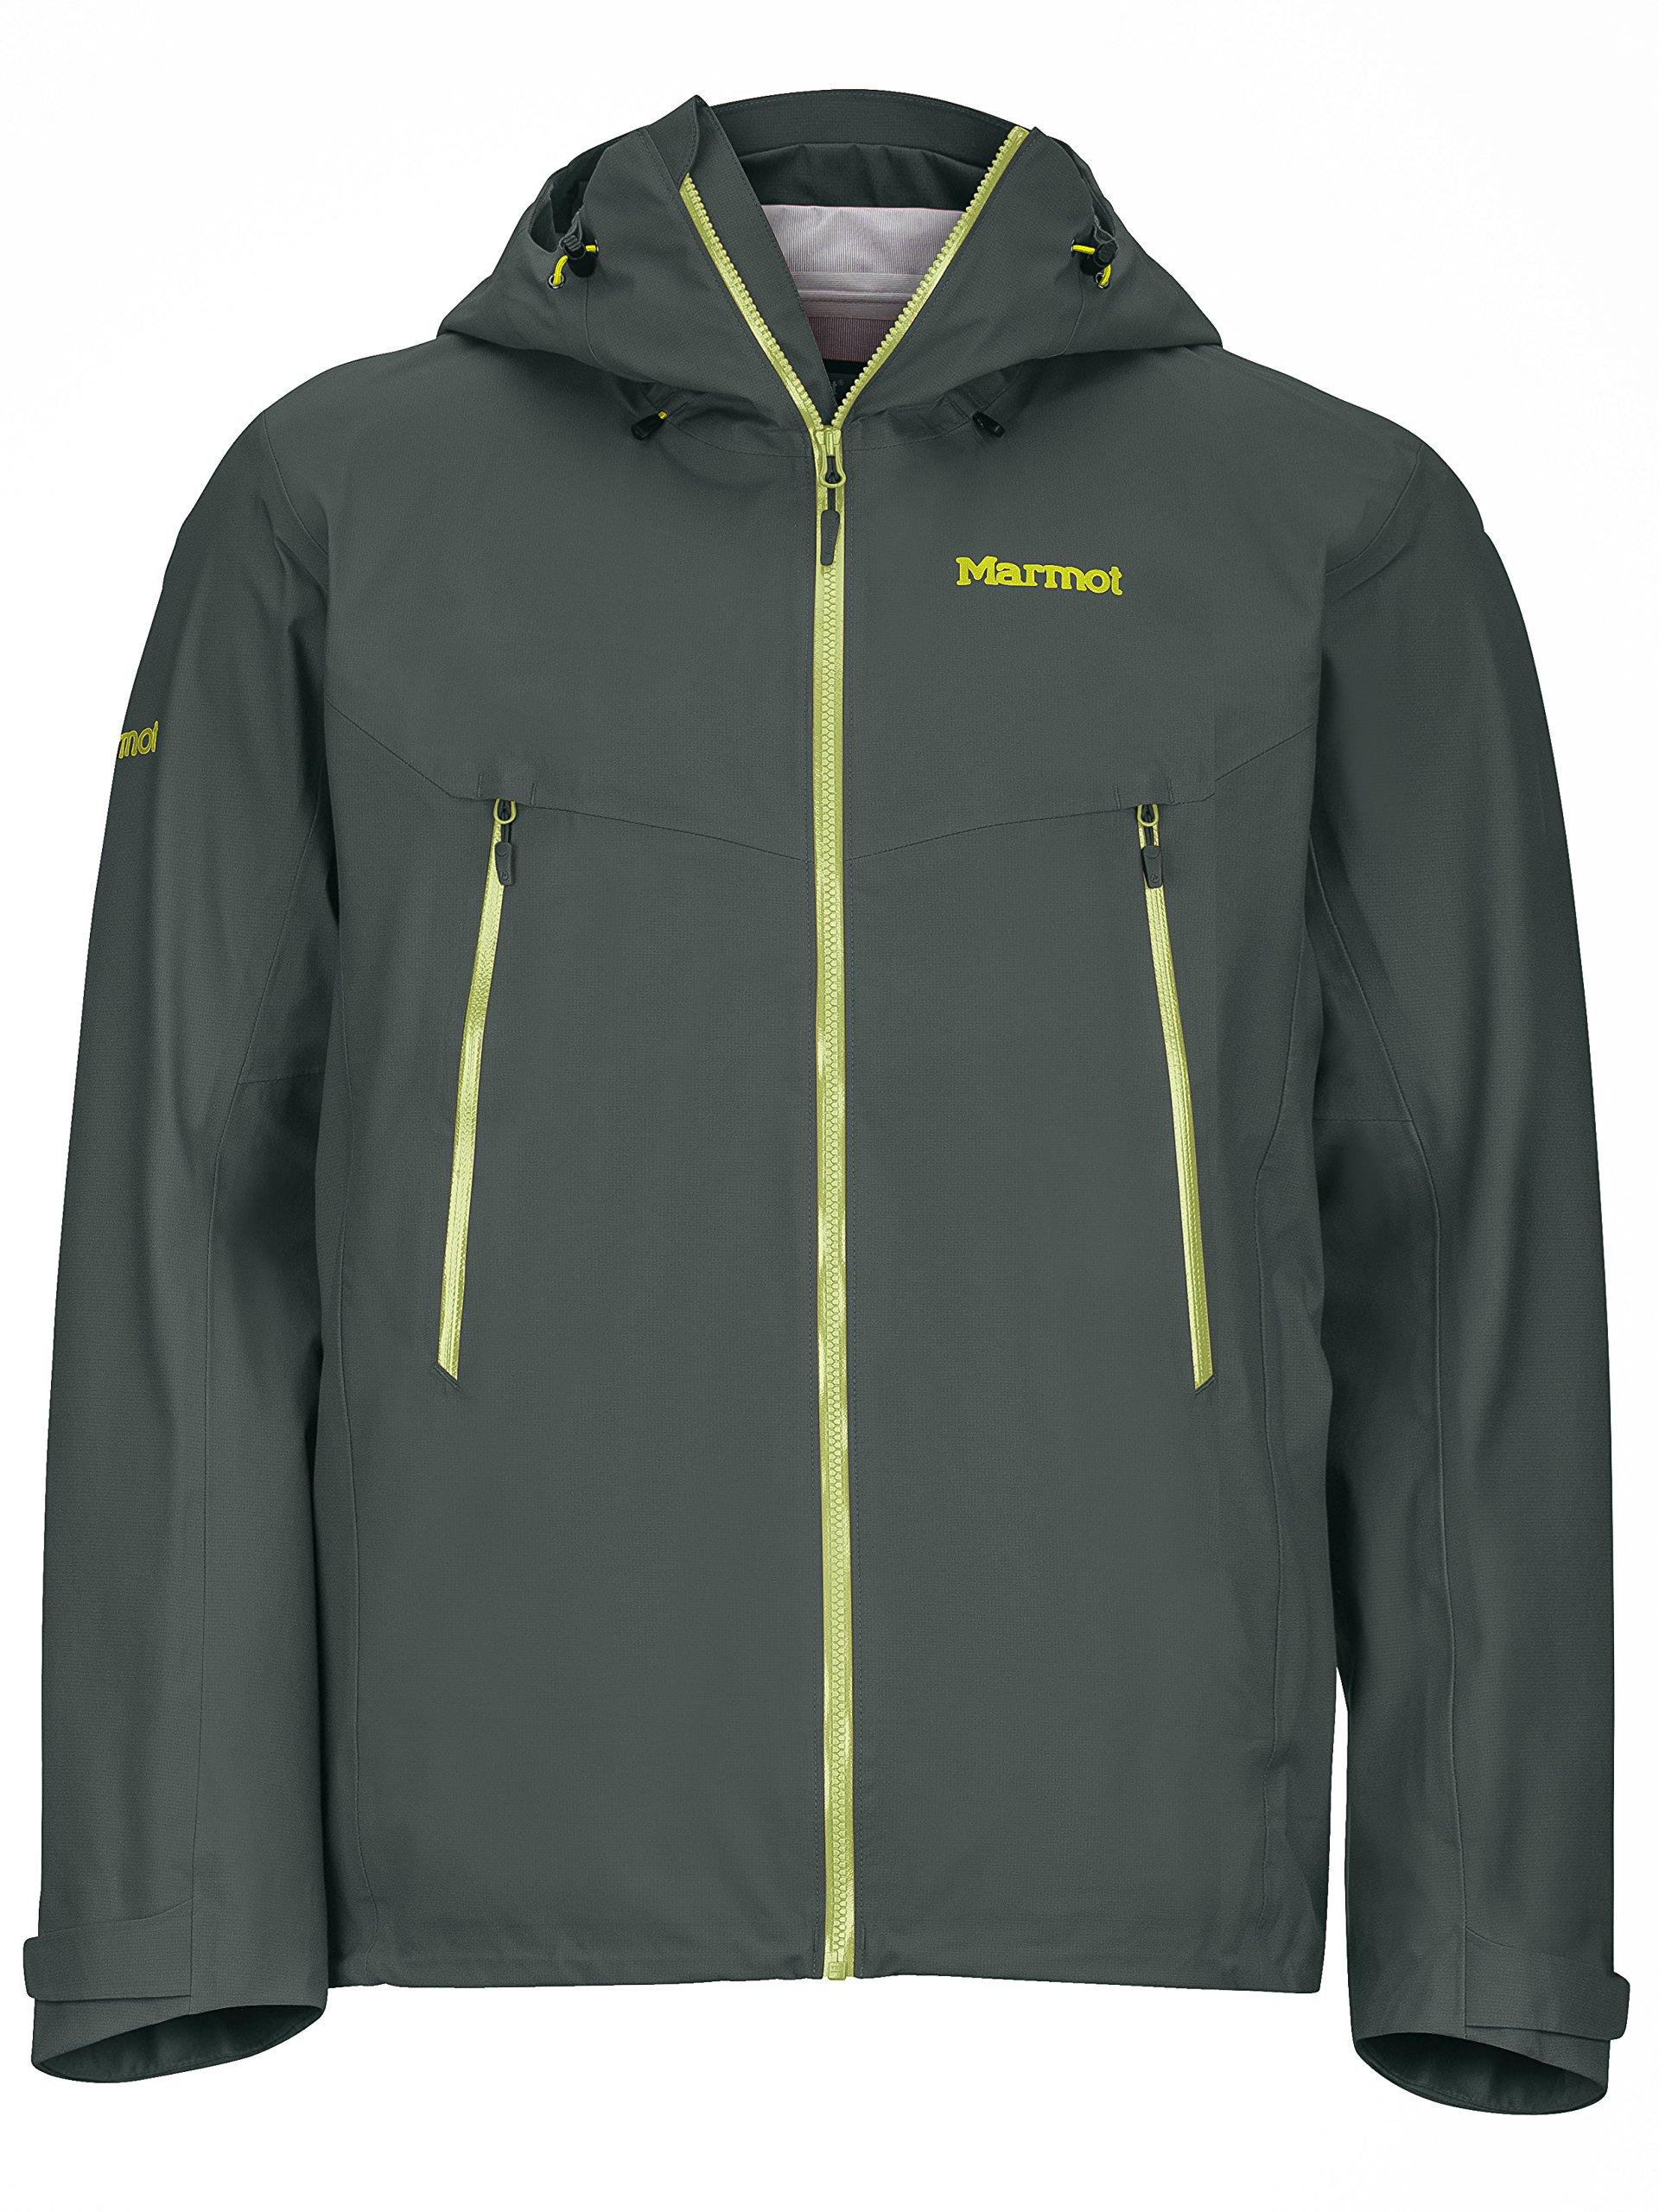 Marmot Red Star Men's Waterproof Rain Jacket, Medium, Dark Zinc by Marmot